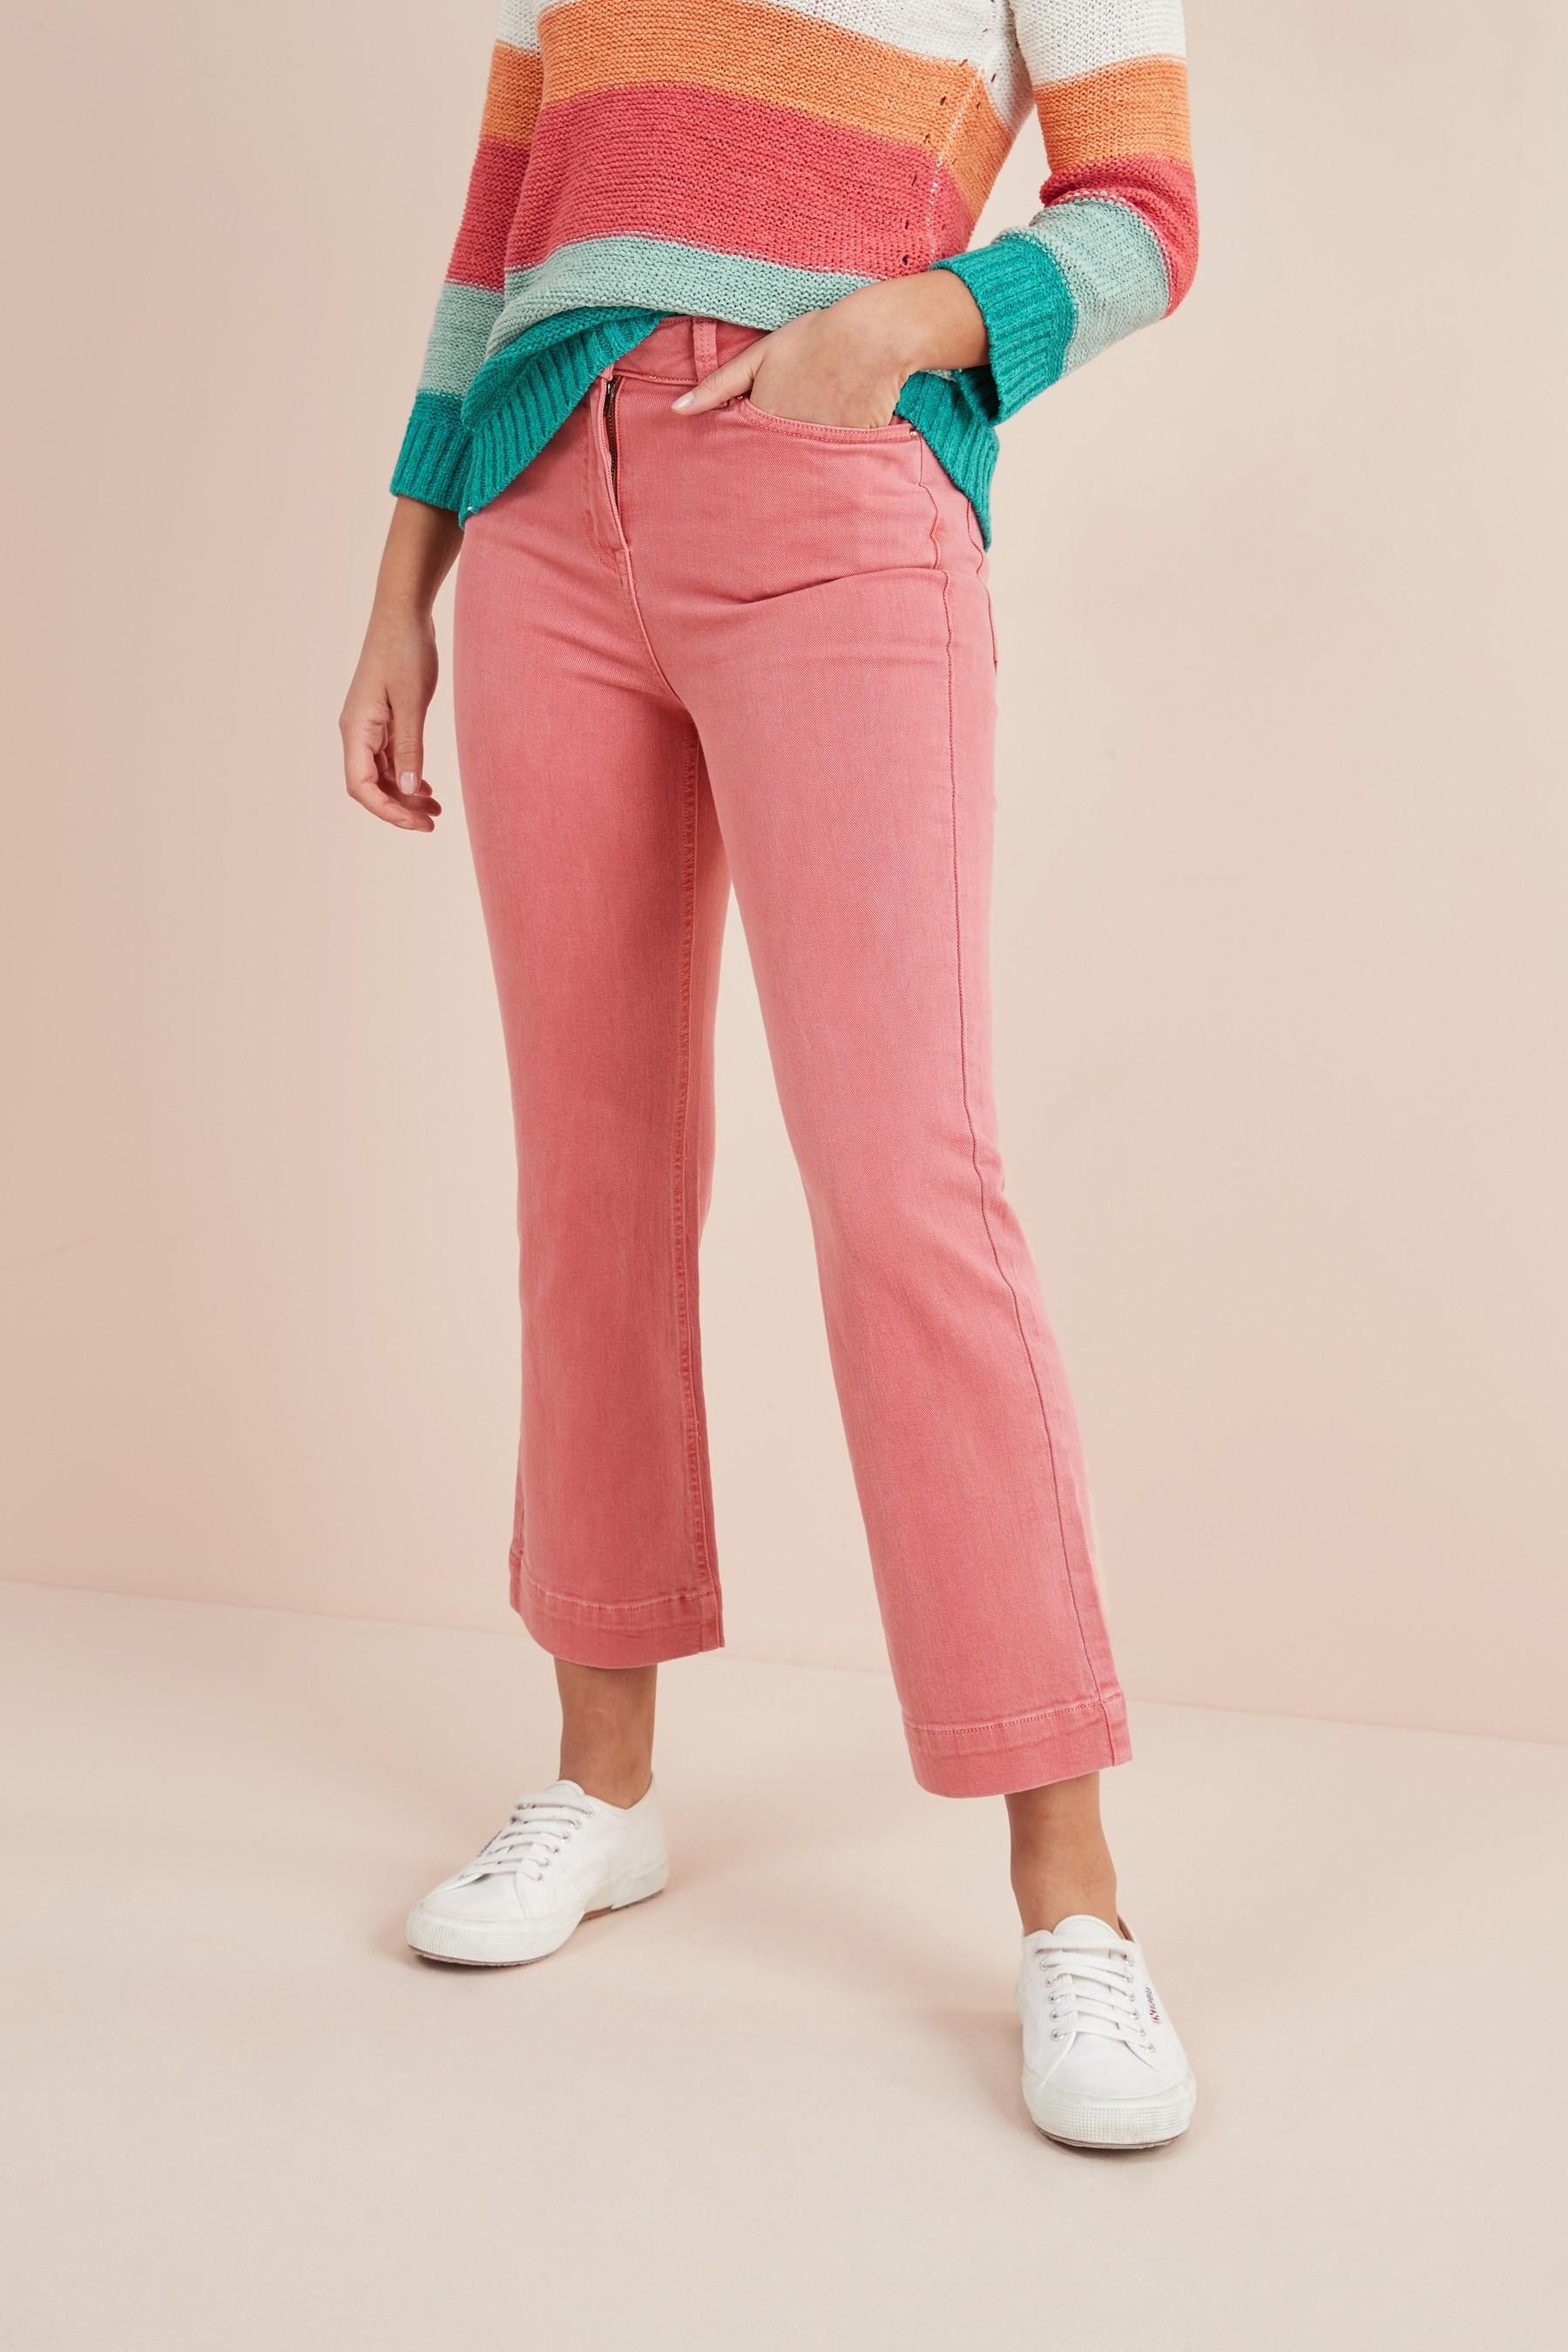 efa4d787c998c Next USA | Shop Online For Fashion & Clothing